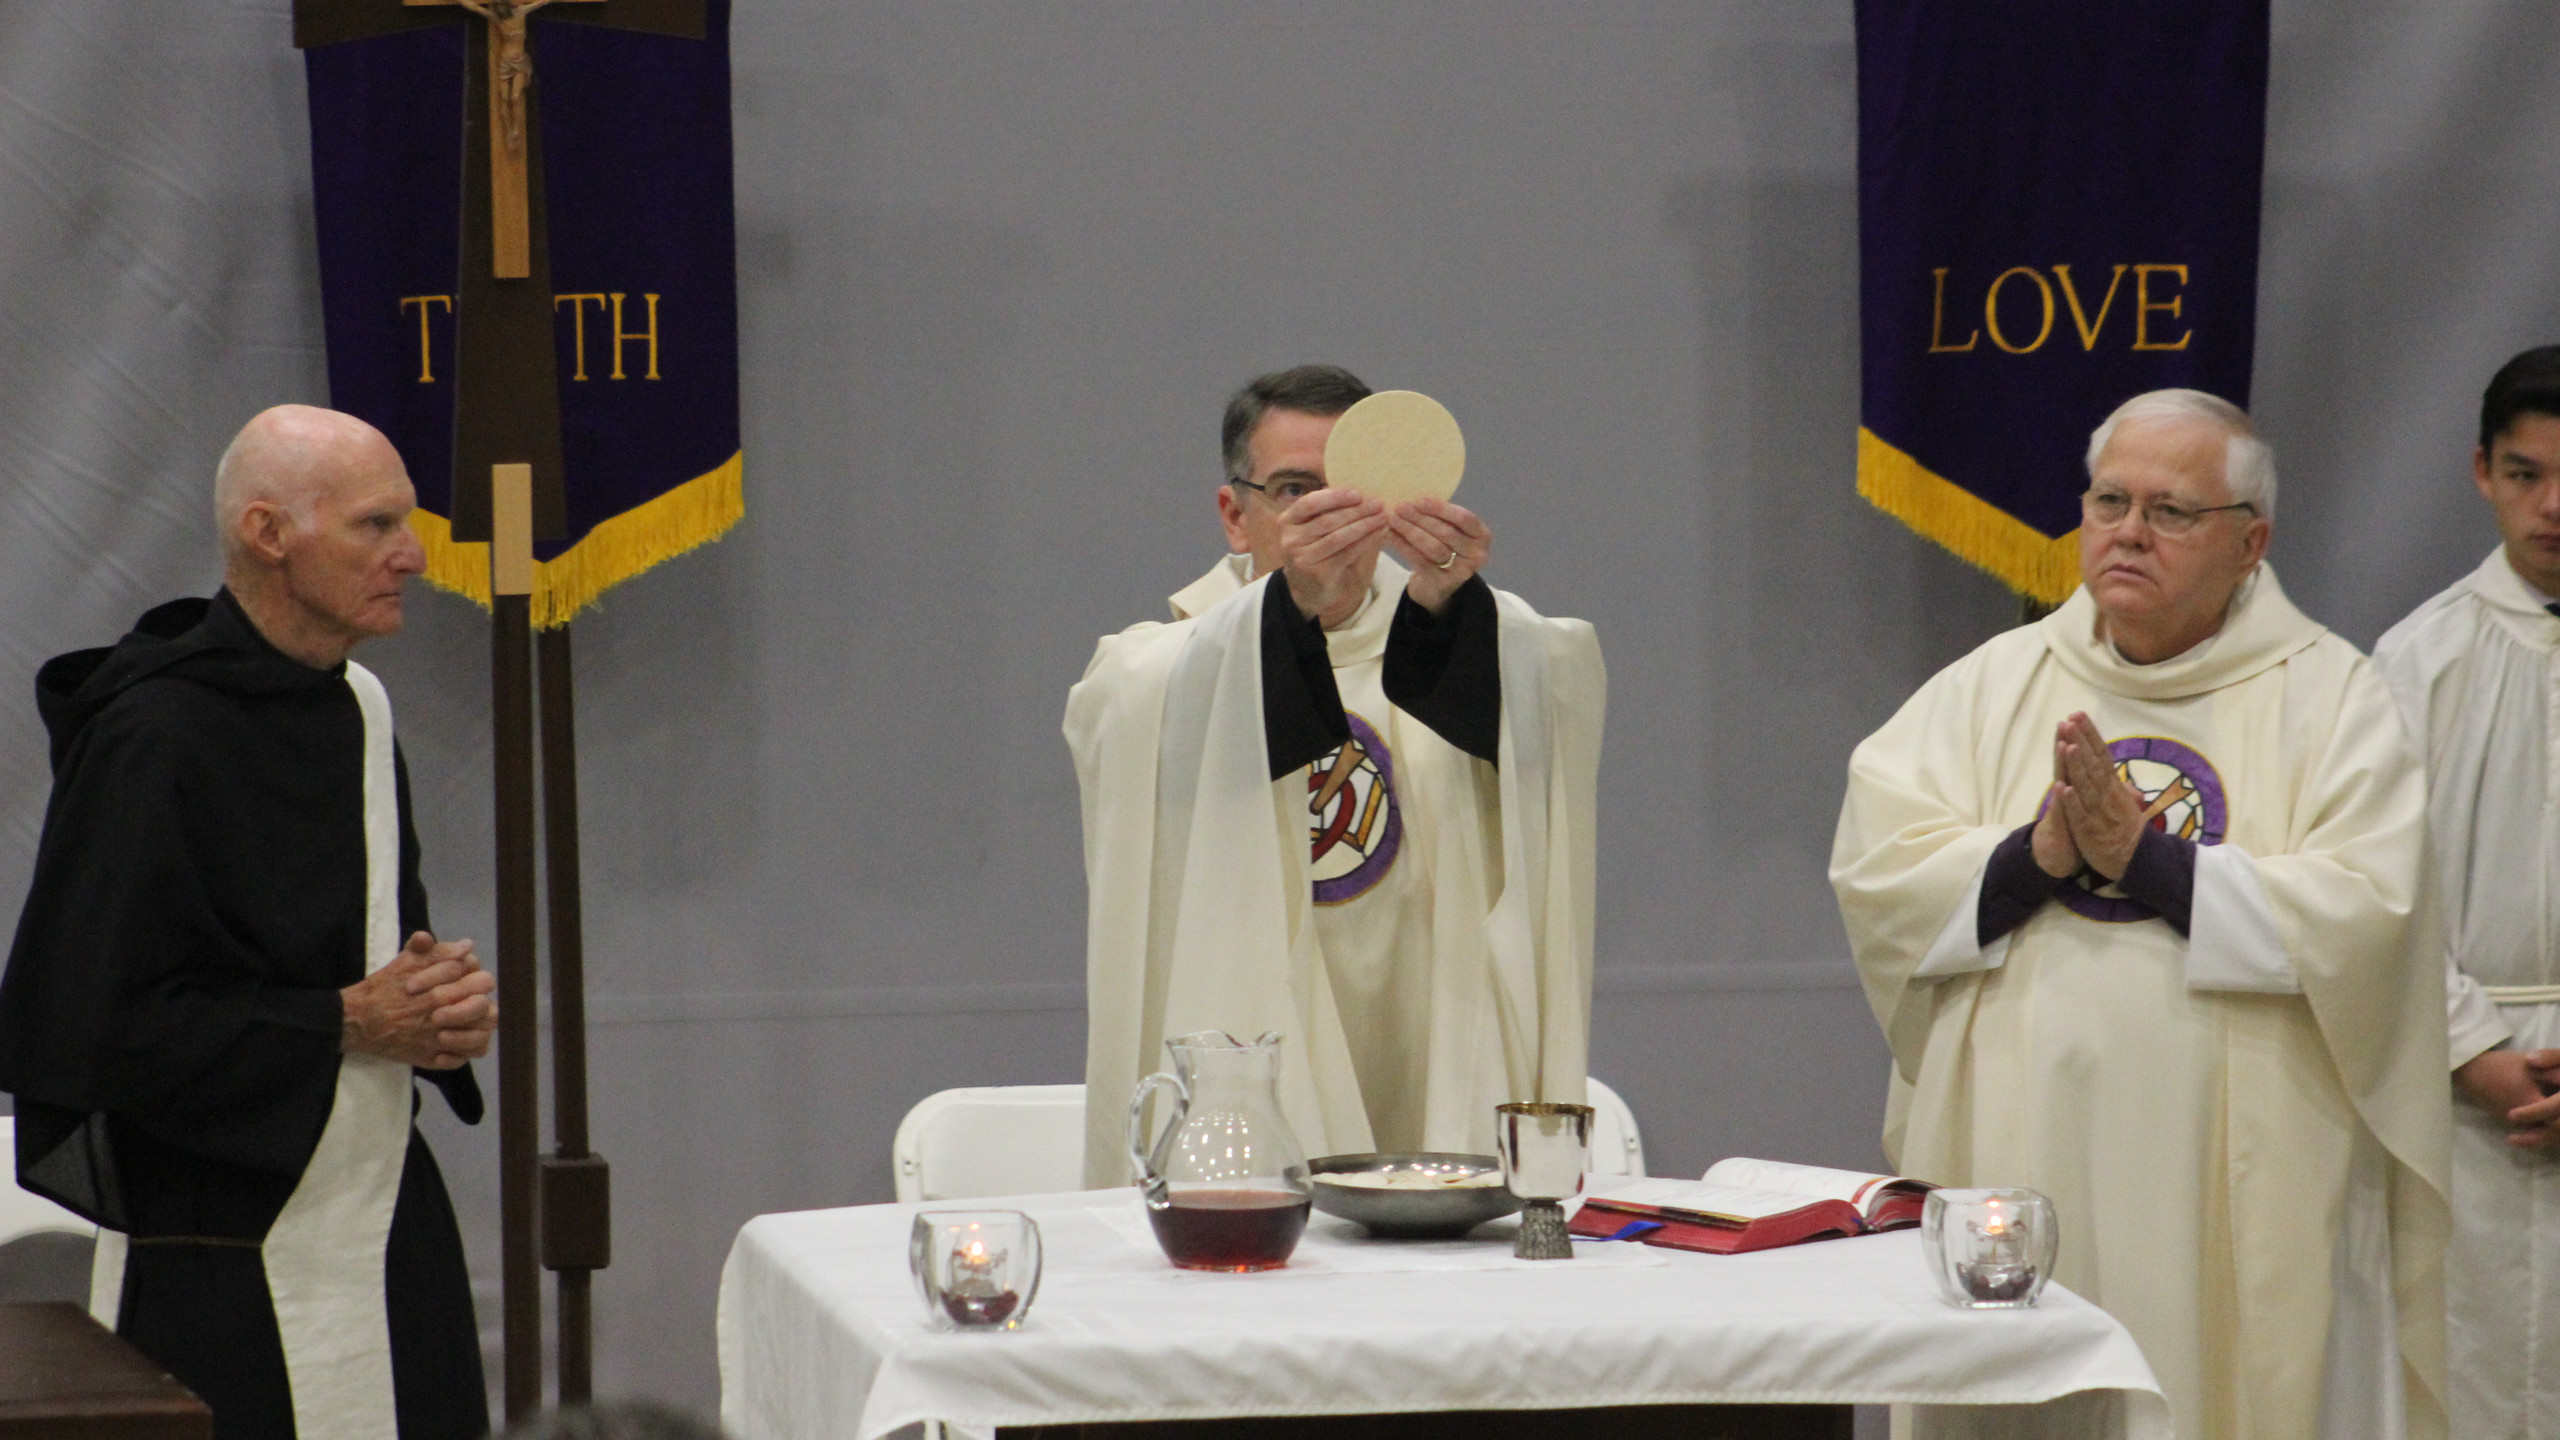 Fr. Joe offering the Eucharist